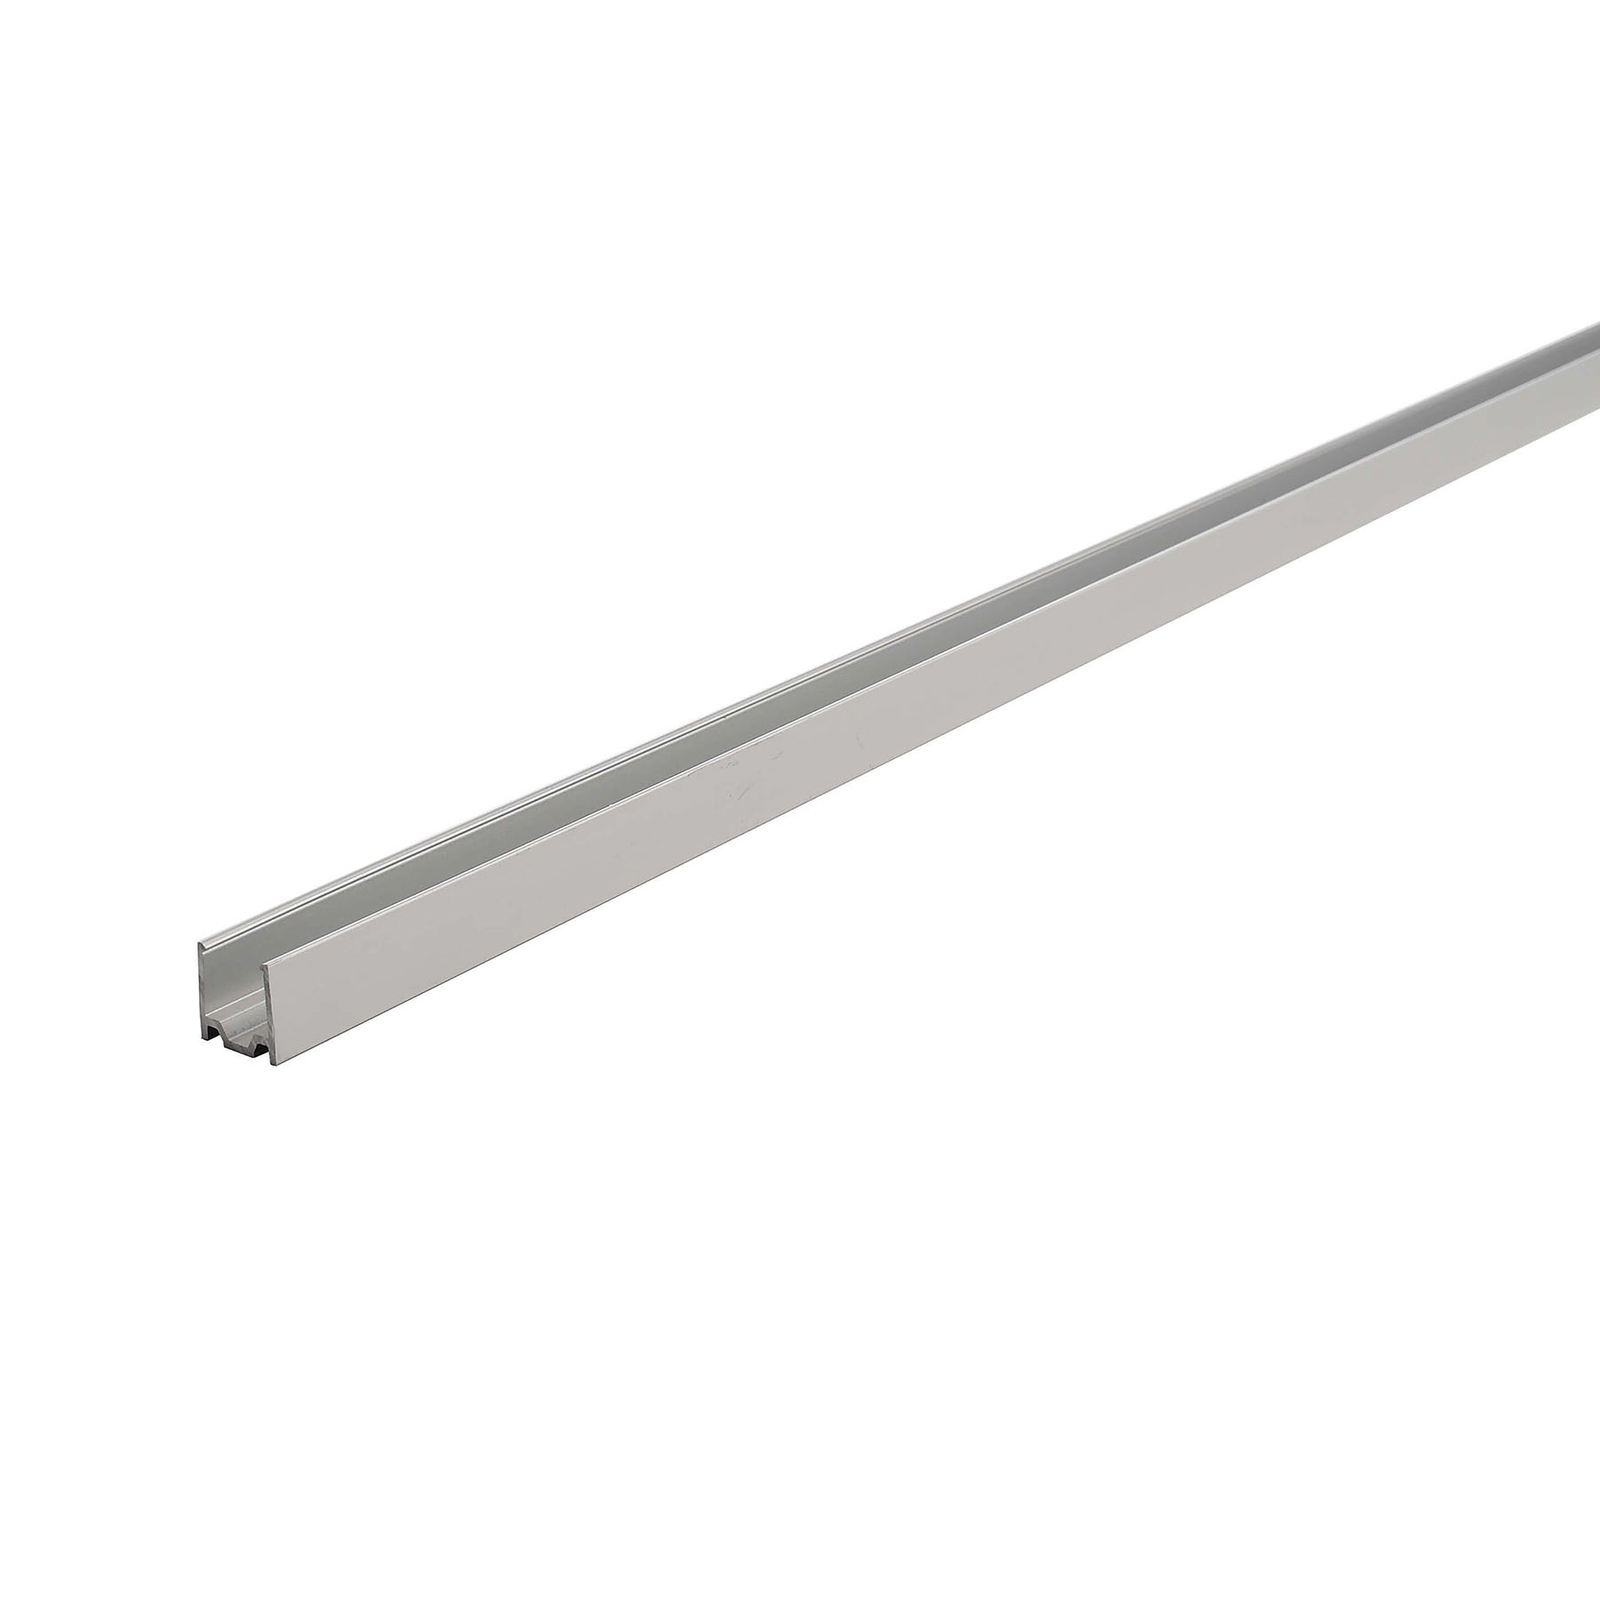 Aluprofil D Flex Line Mini Top View LED-stripe 1m